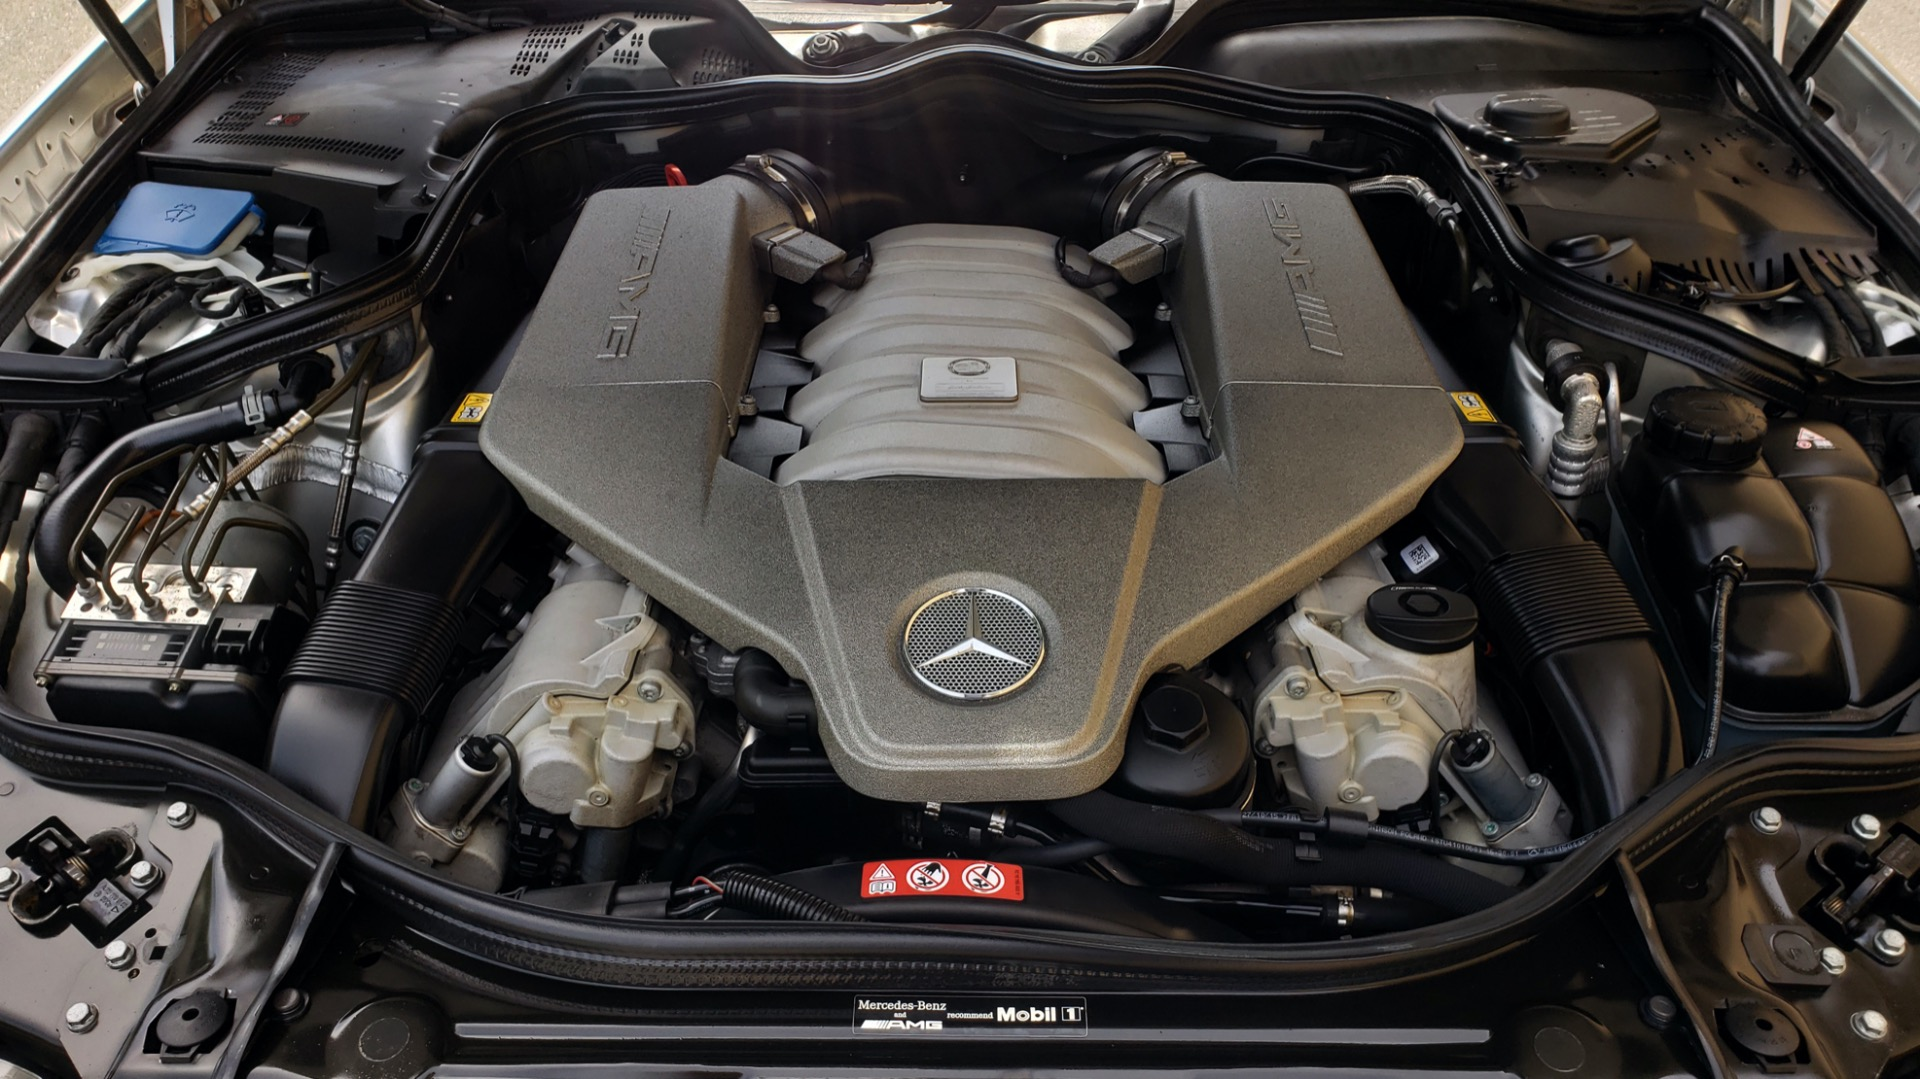 Used 2007 Mercedes-Benz E-Class E63 AMG WAGON / NAV / SUNROOF / HARMAN/KARDON for sale $29,000 at Formula Imports in Charlotte NC 28227 12